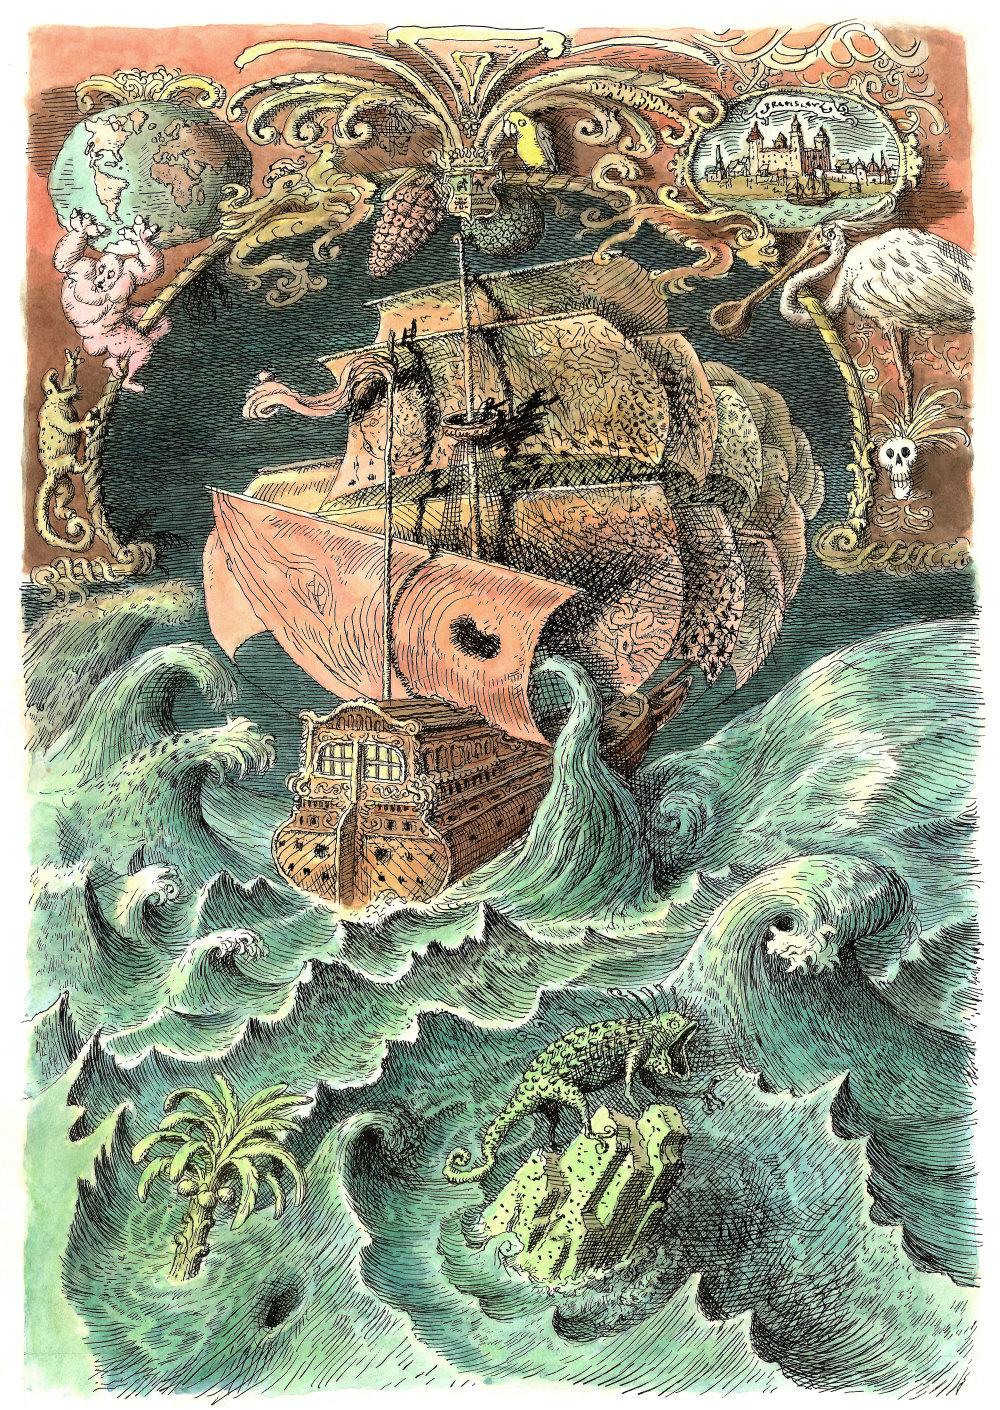 Peter Kľúčik (1953) D. Defoe: Život adobrodružstvá Robinsona Crusoea, Mladé letá, 1991